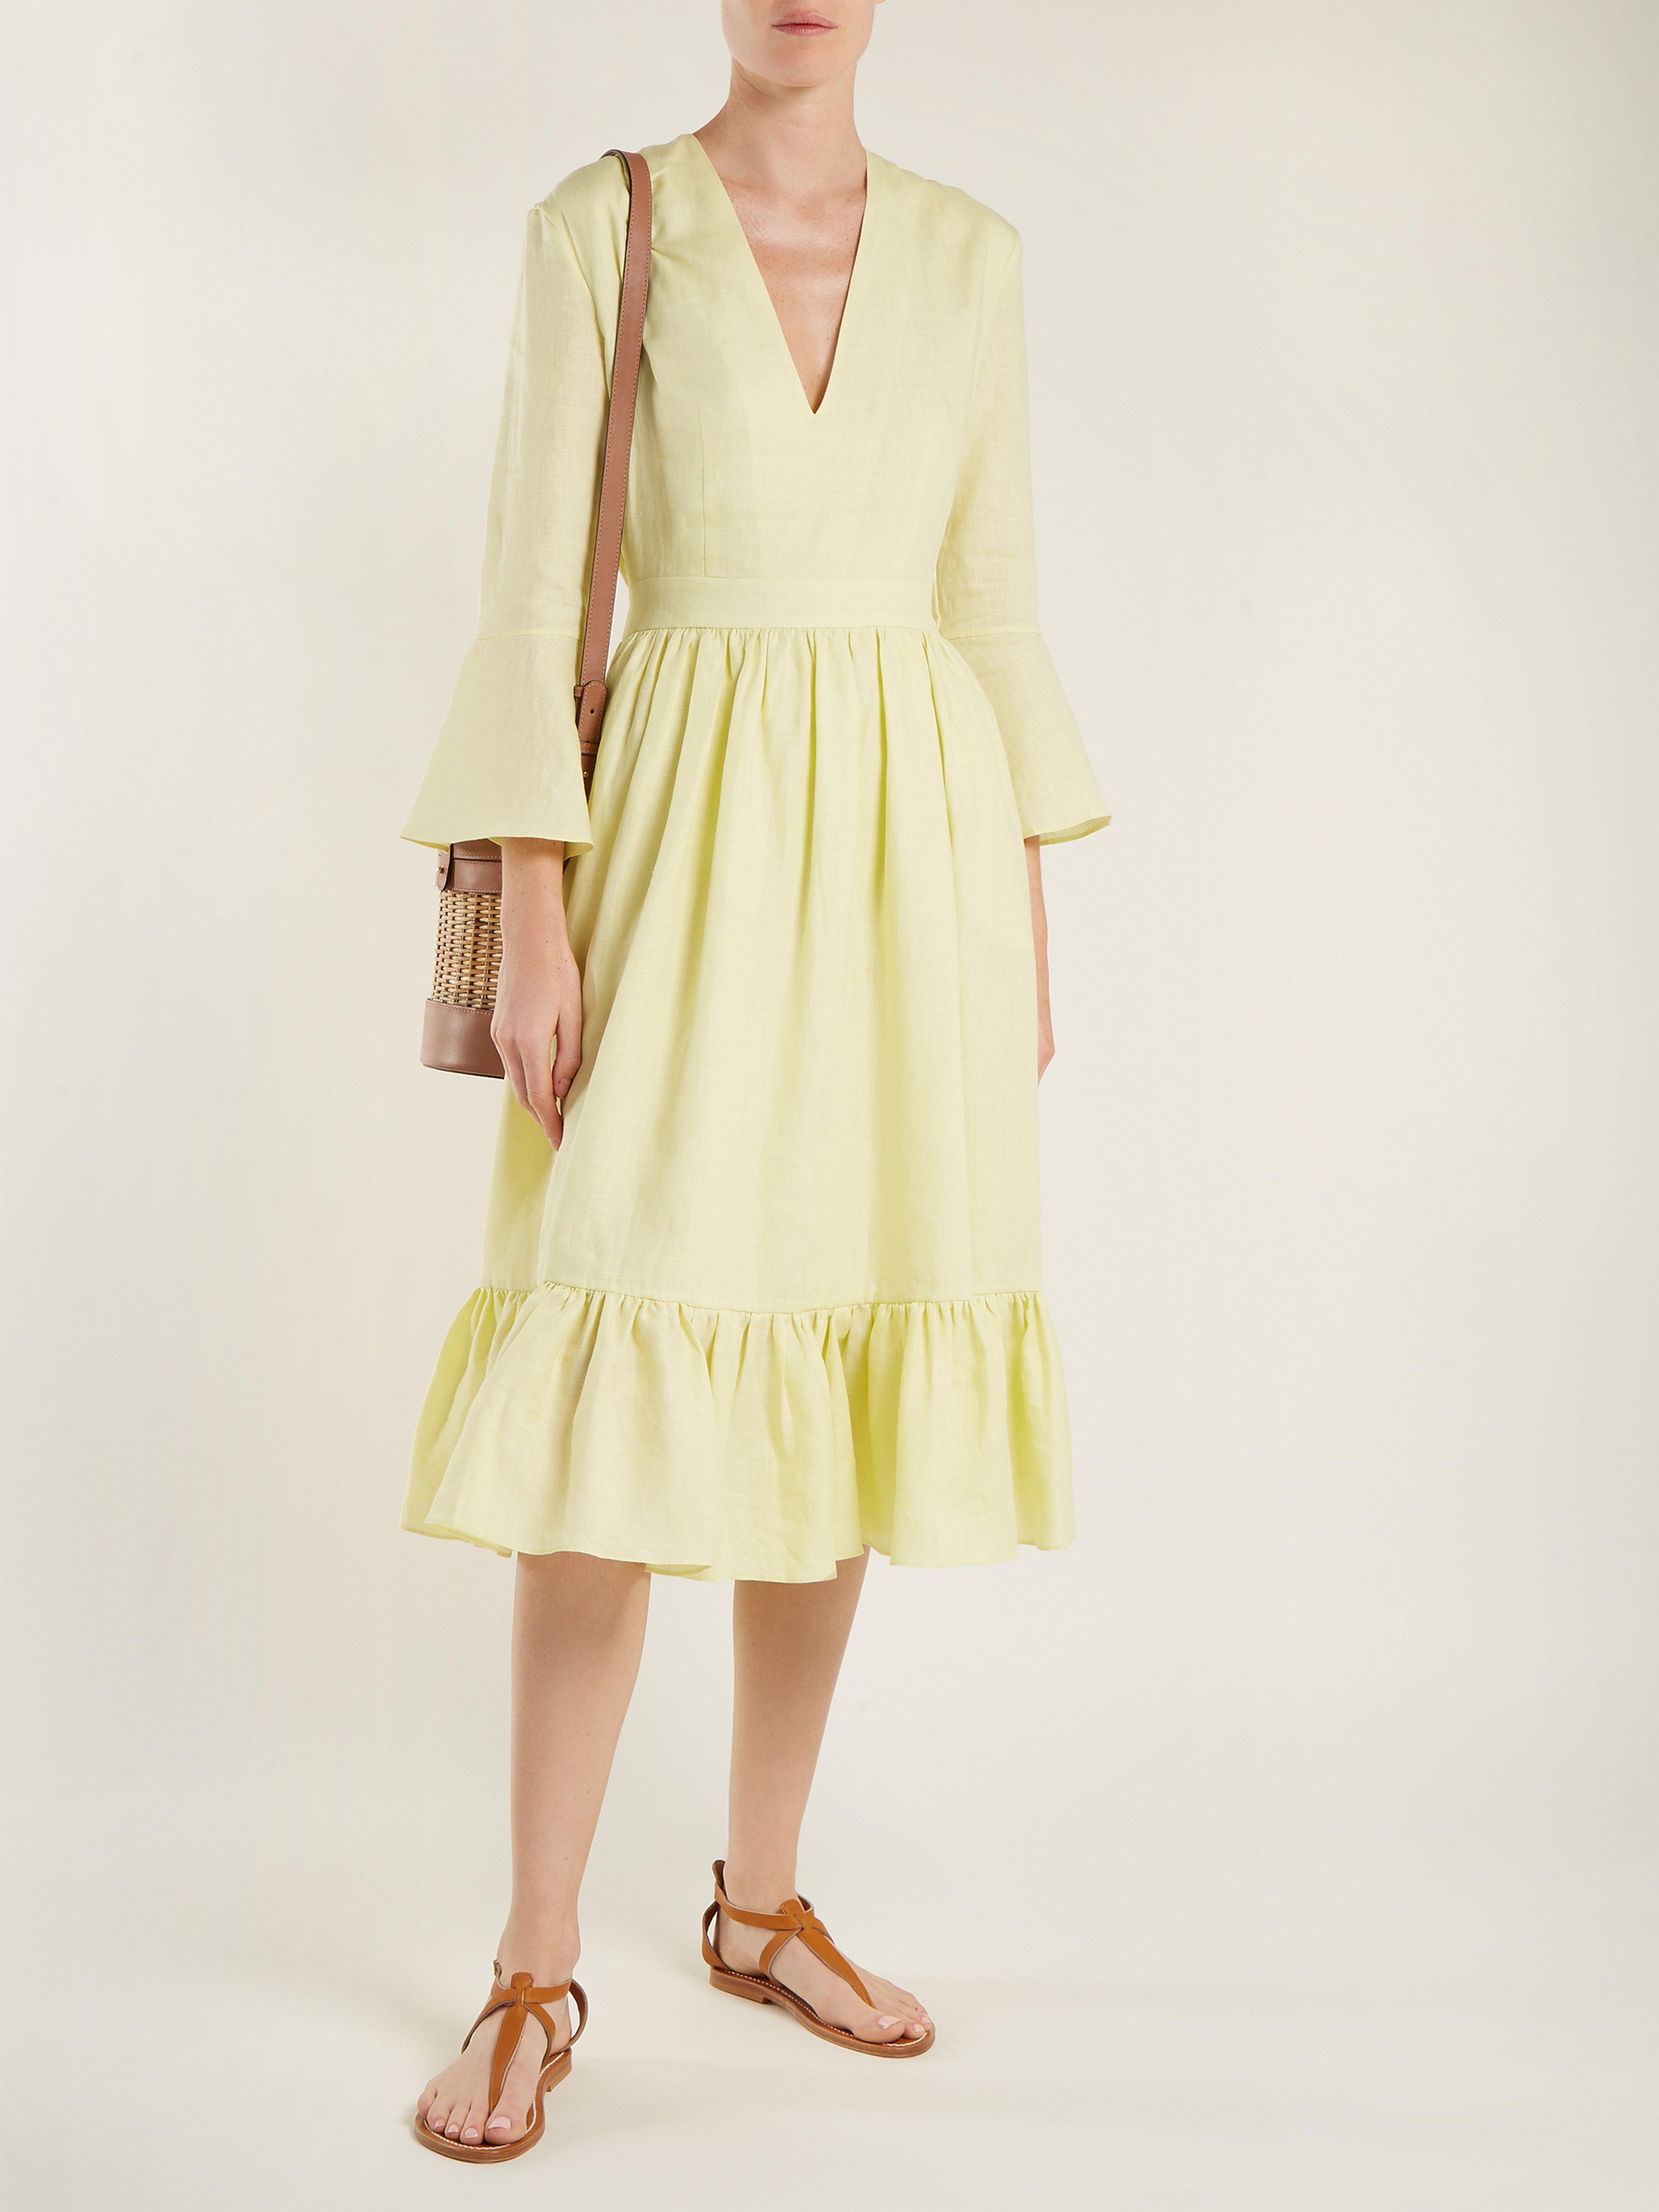 5577f52095 Loup Charmant Sea Island Linen Midi Dress in Yellow - Lyst